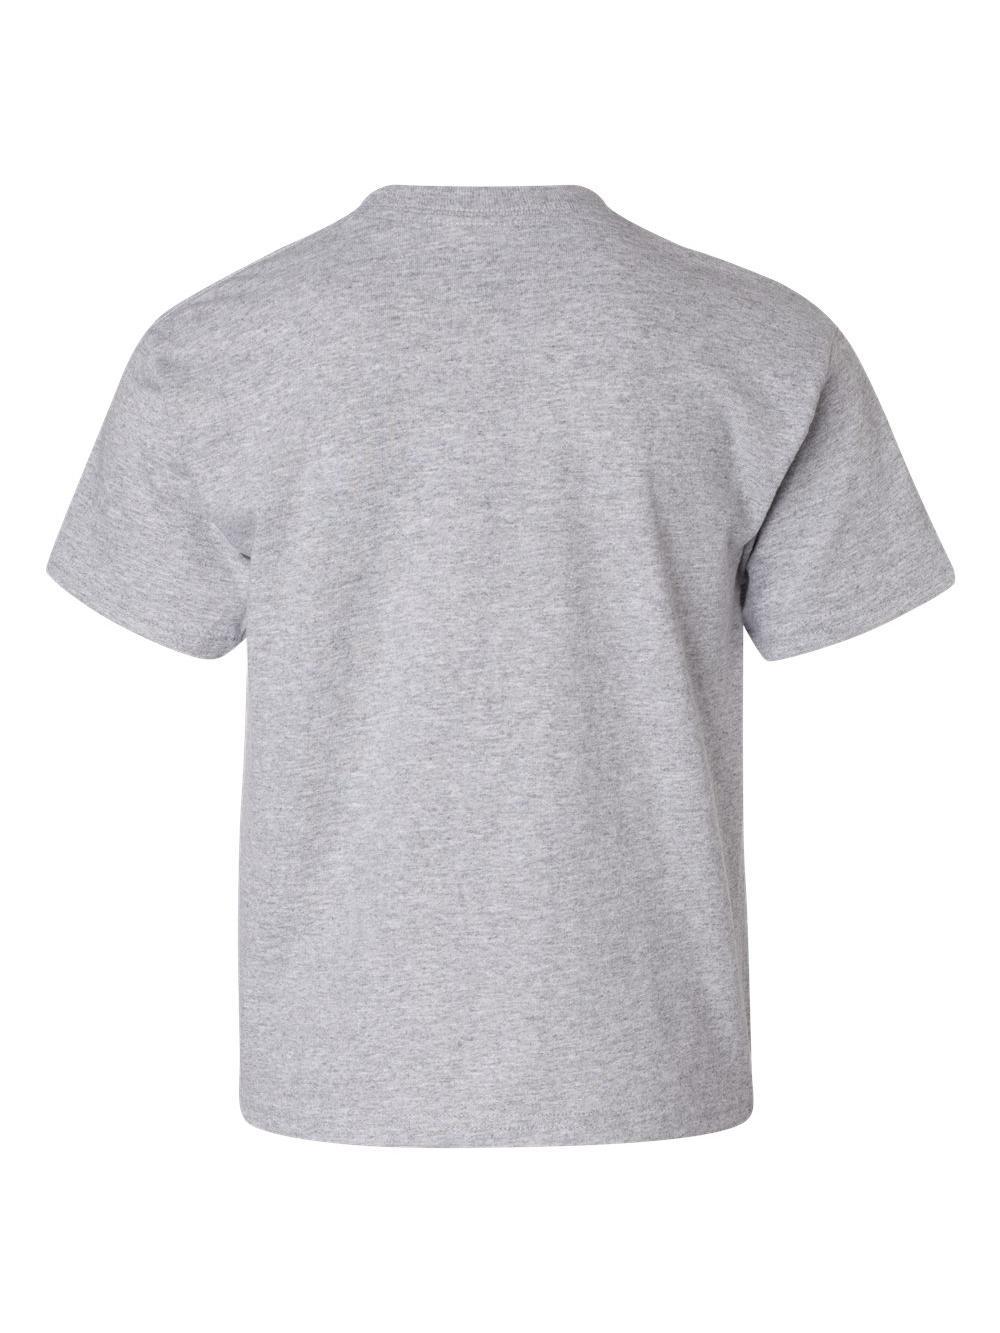 Gildan-Heavy-Cotton-Youth-T-Shirt-5000B thumbnail 133